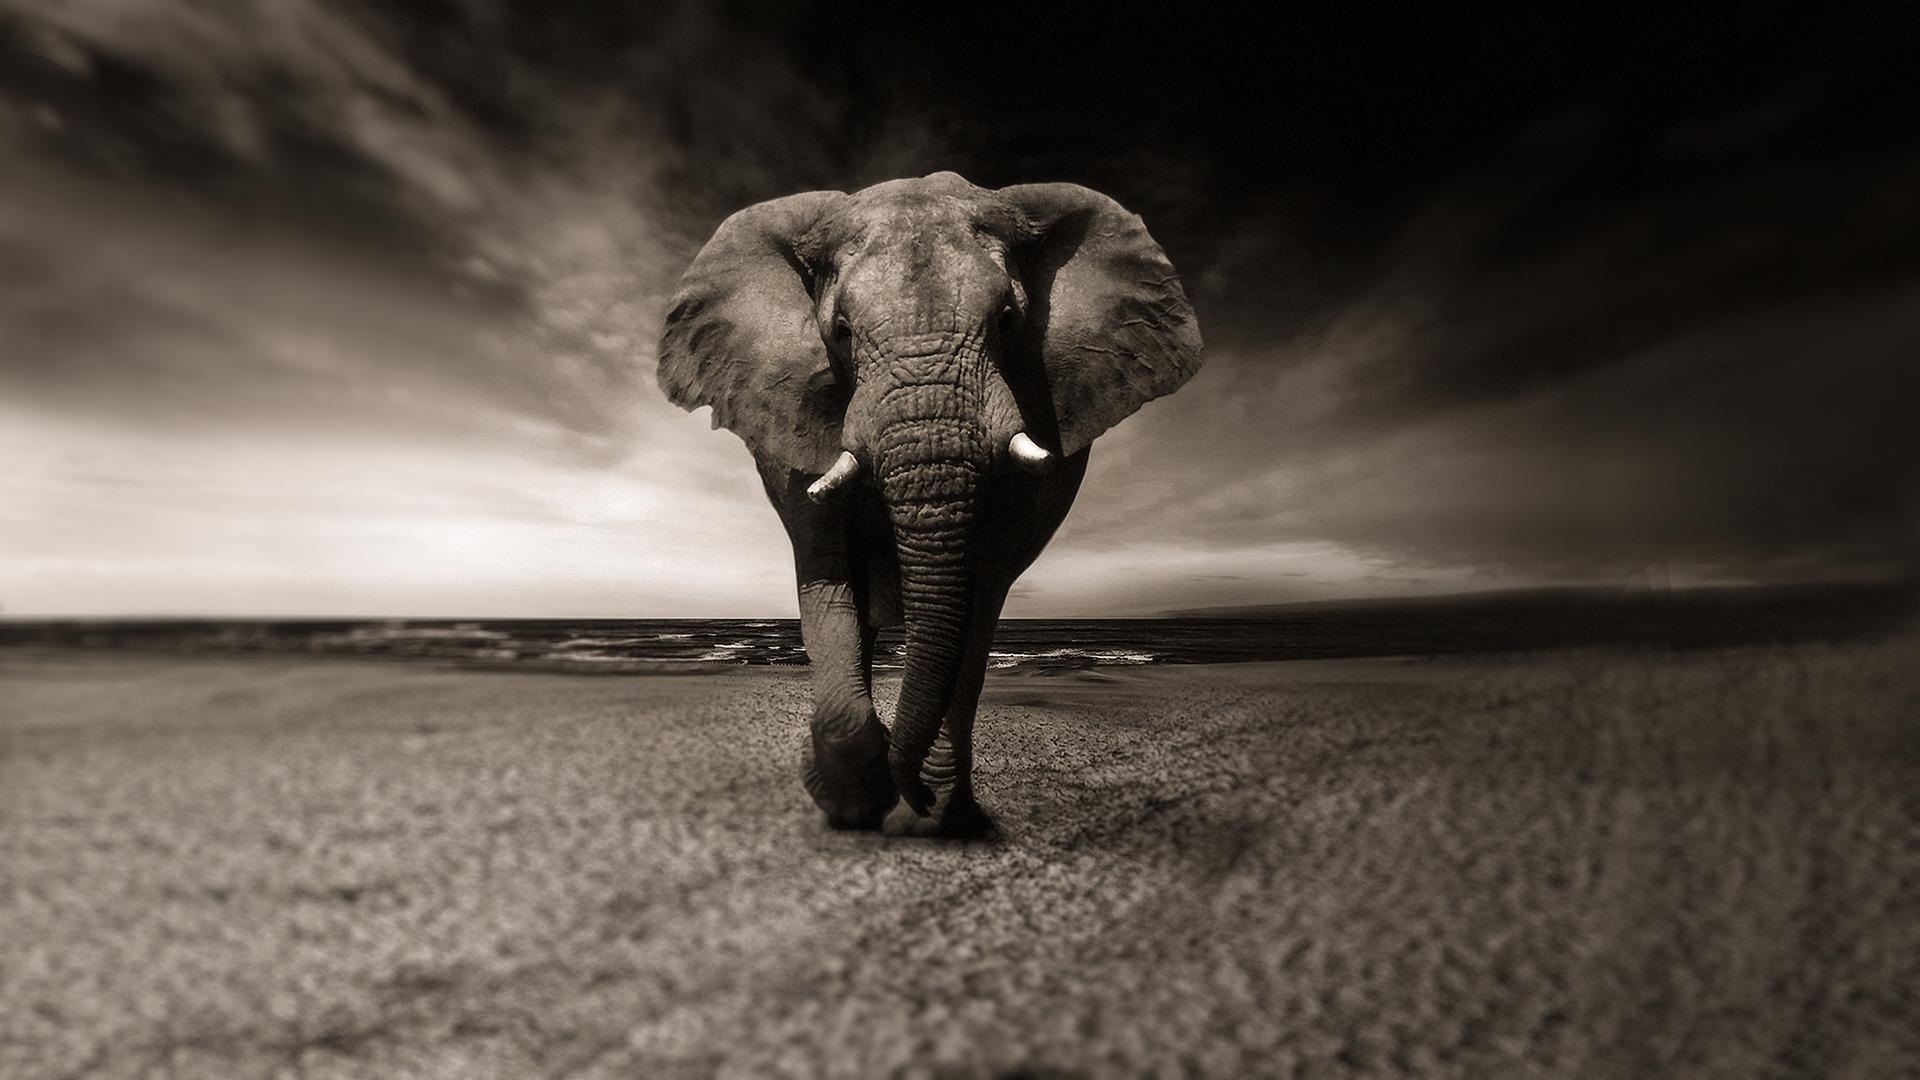 8k Animal Wallpaper Download: African Elephant 4K Chromebook Wallpaper